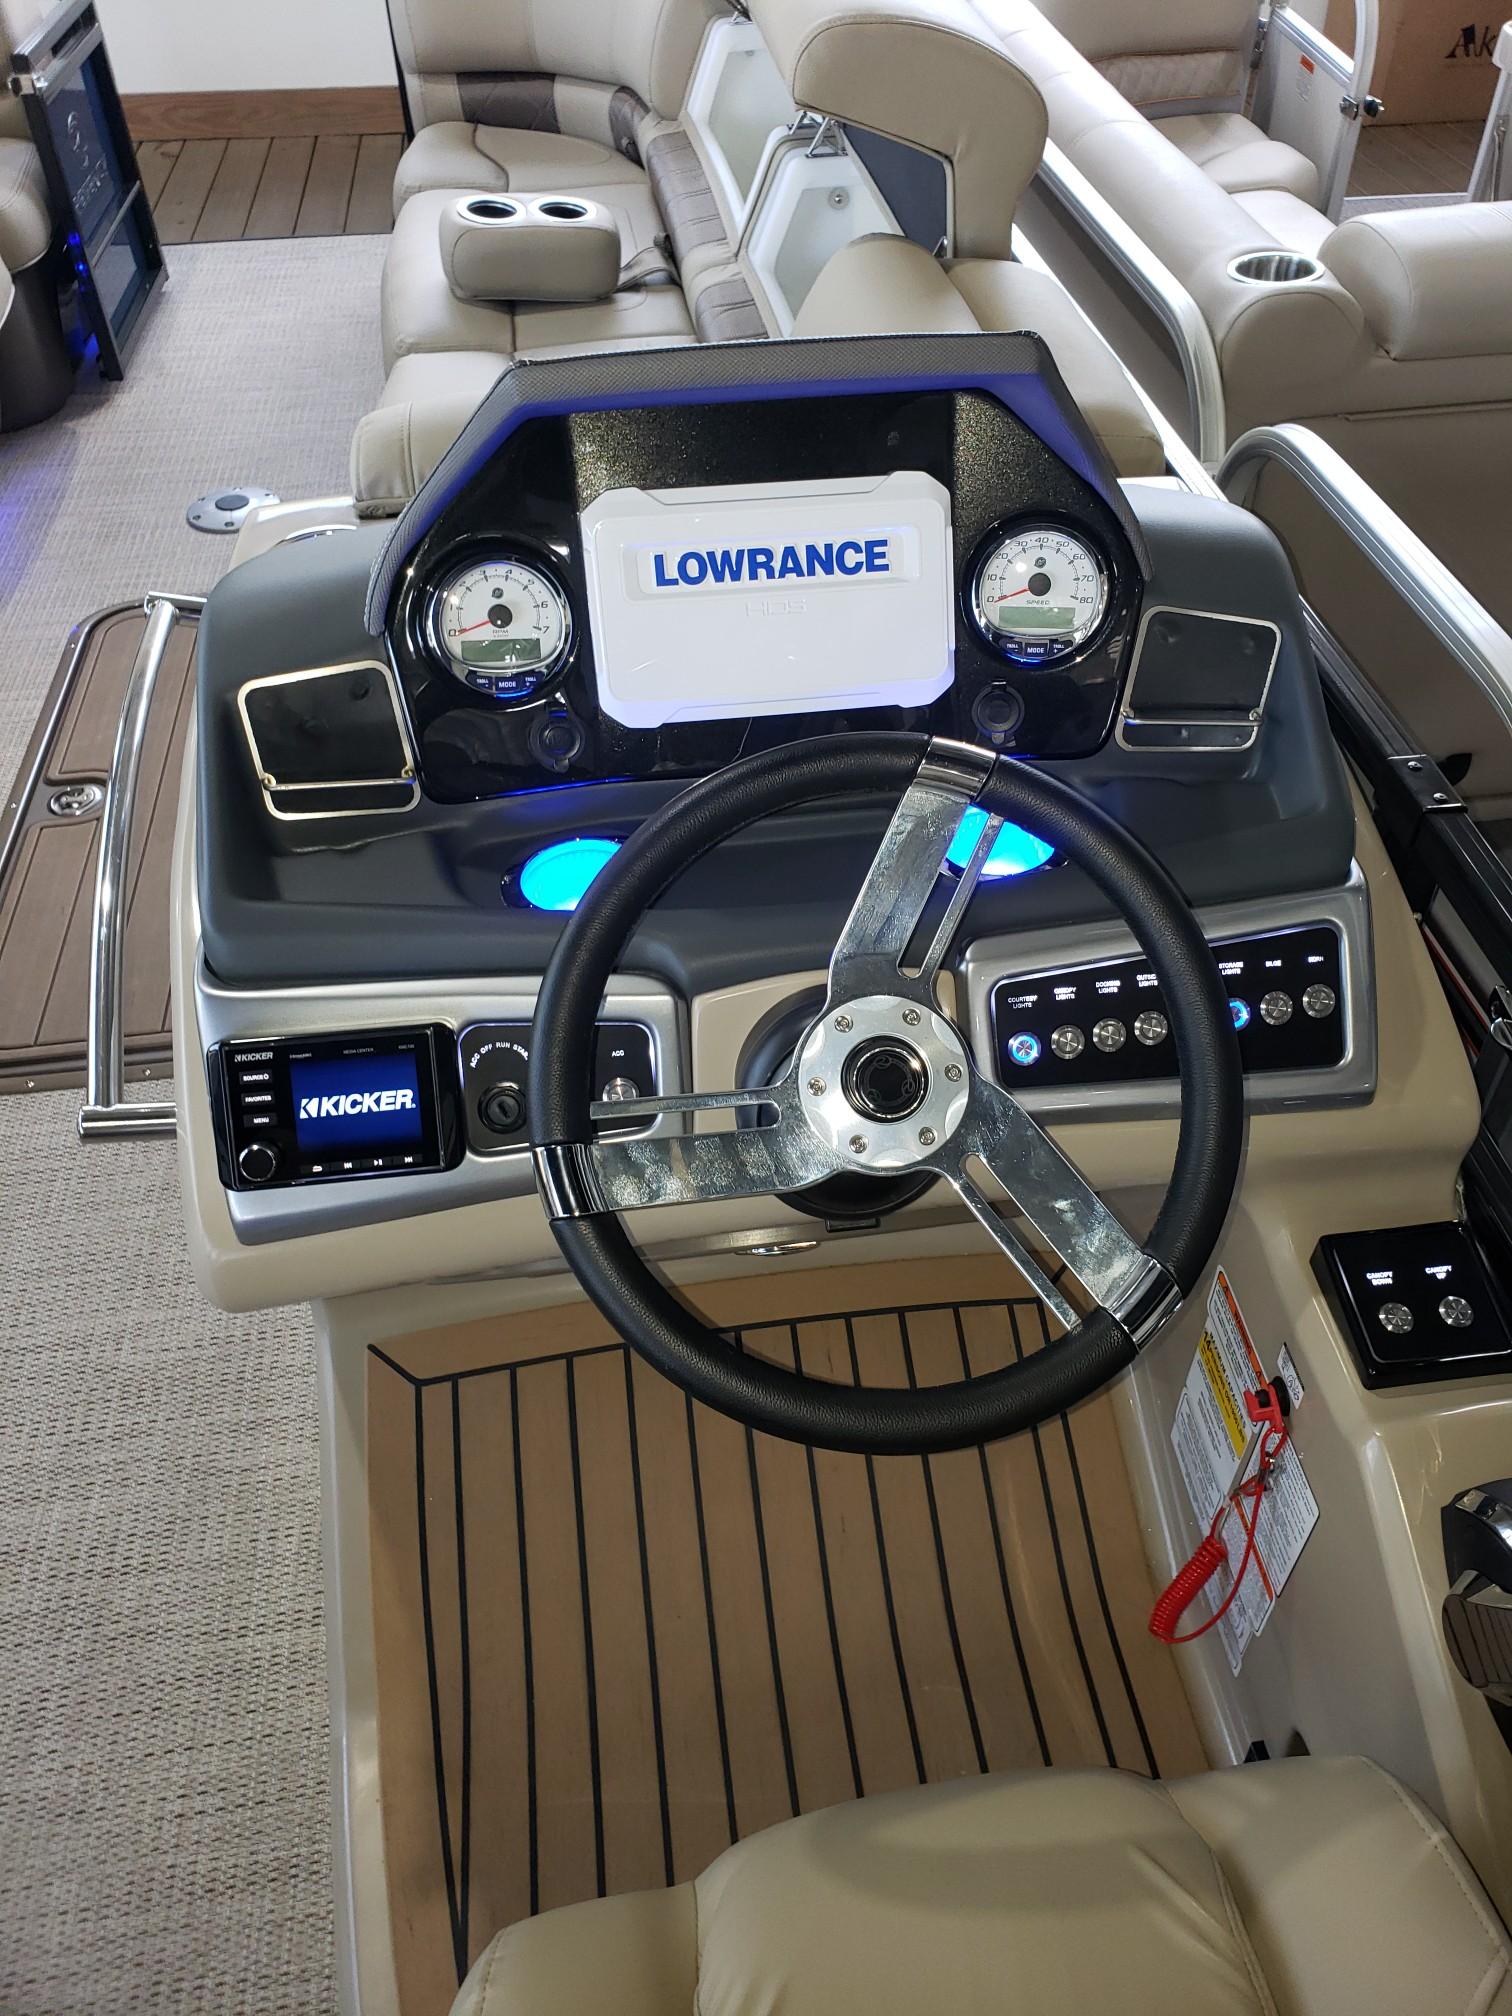 2020 Regency boat for sale, model of the boat is 250 LE3 w/300L Verado & Image # 7 of 27